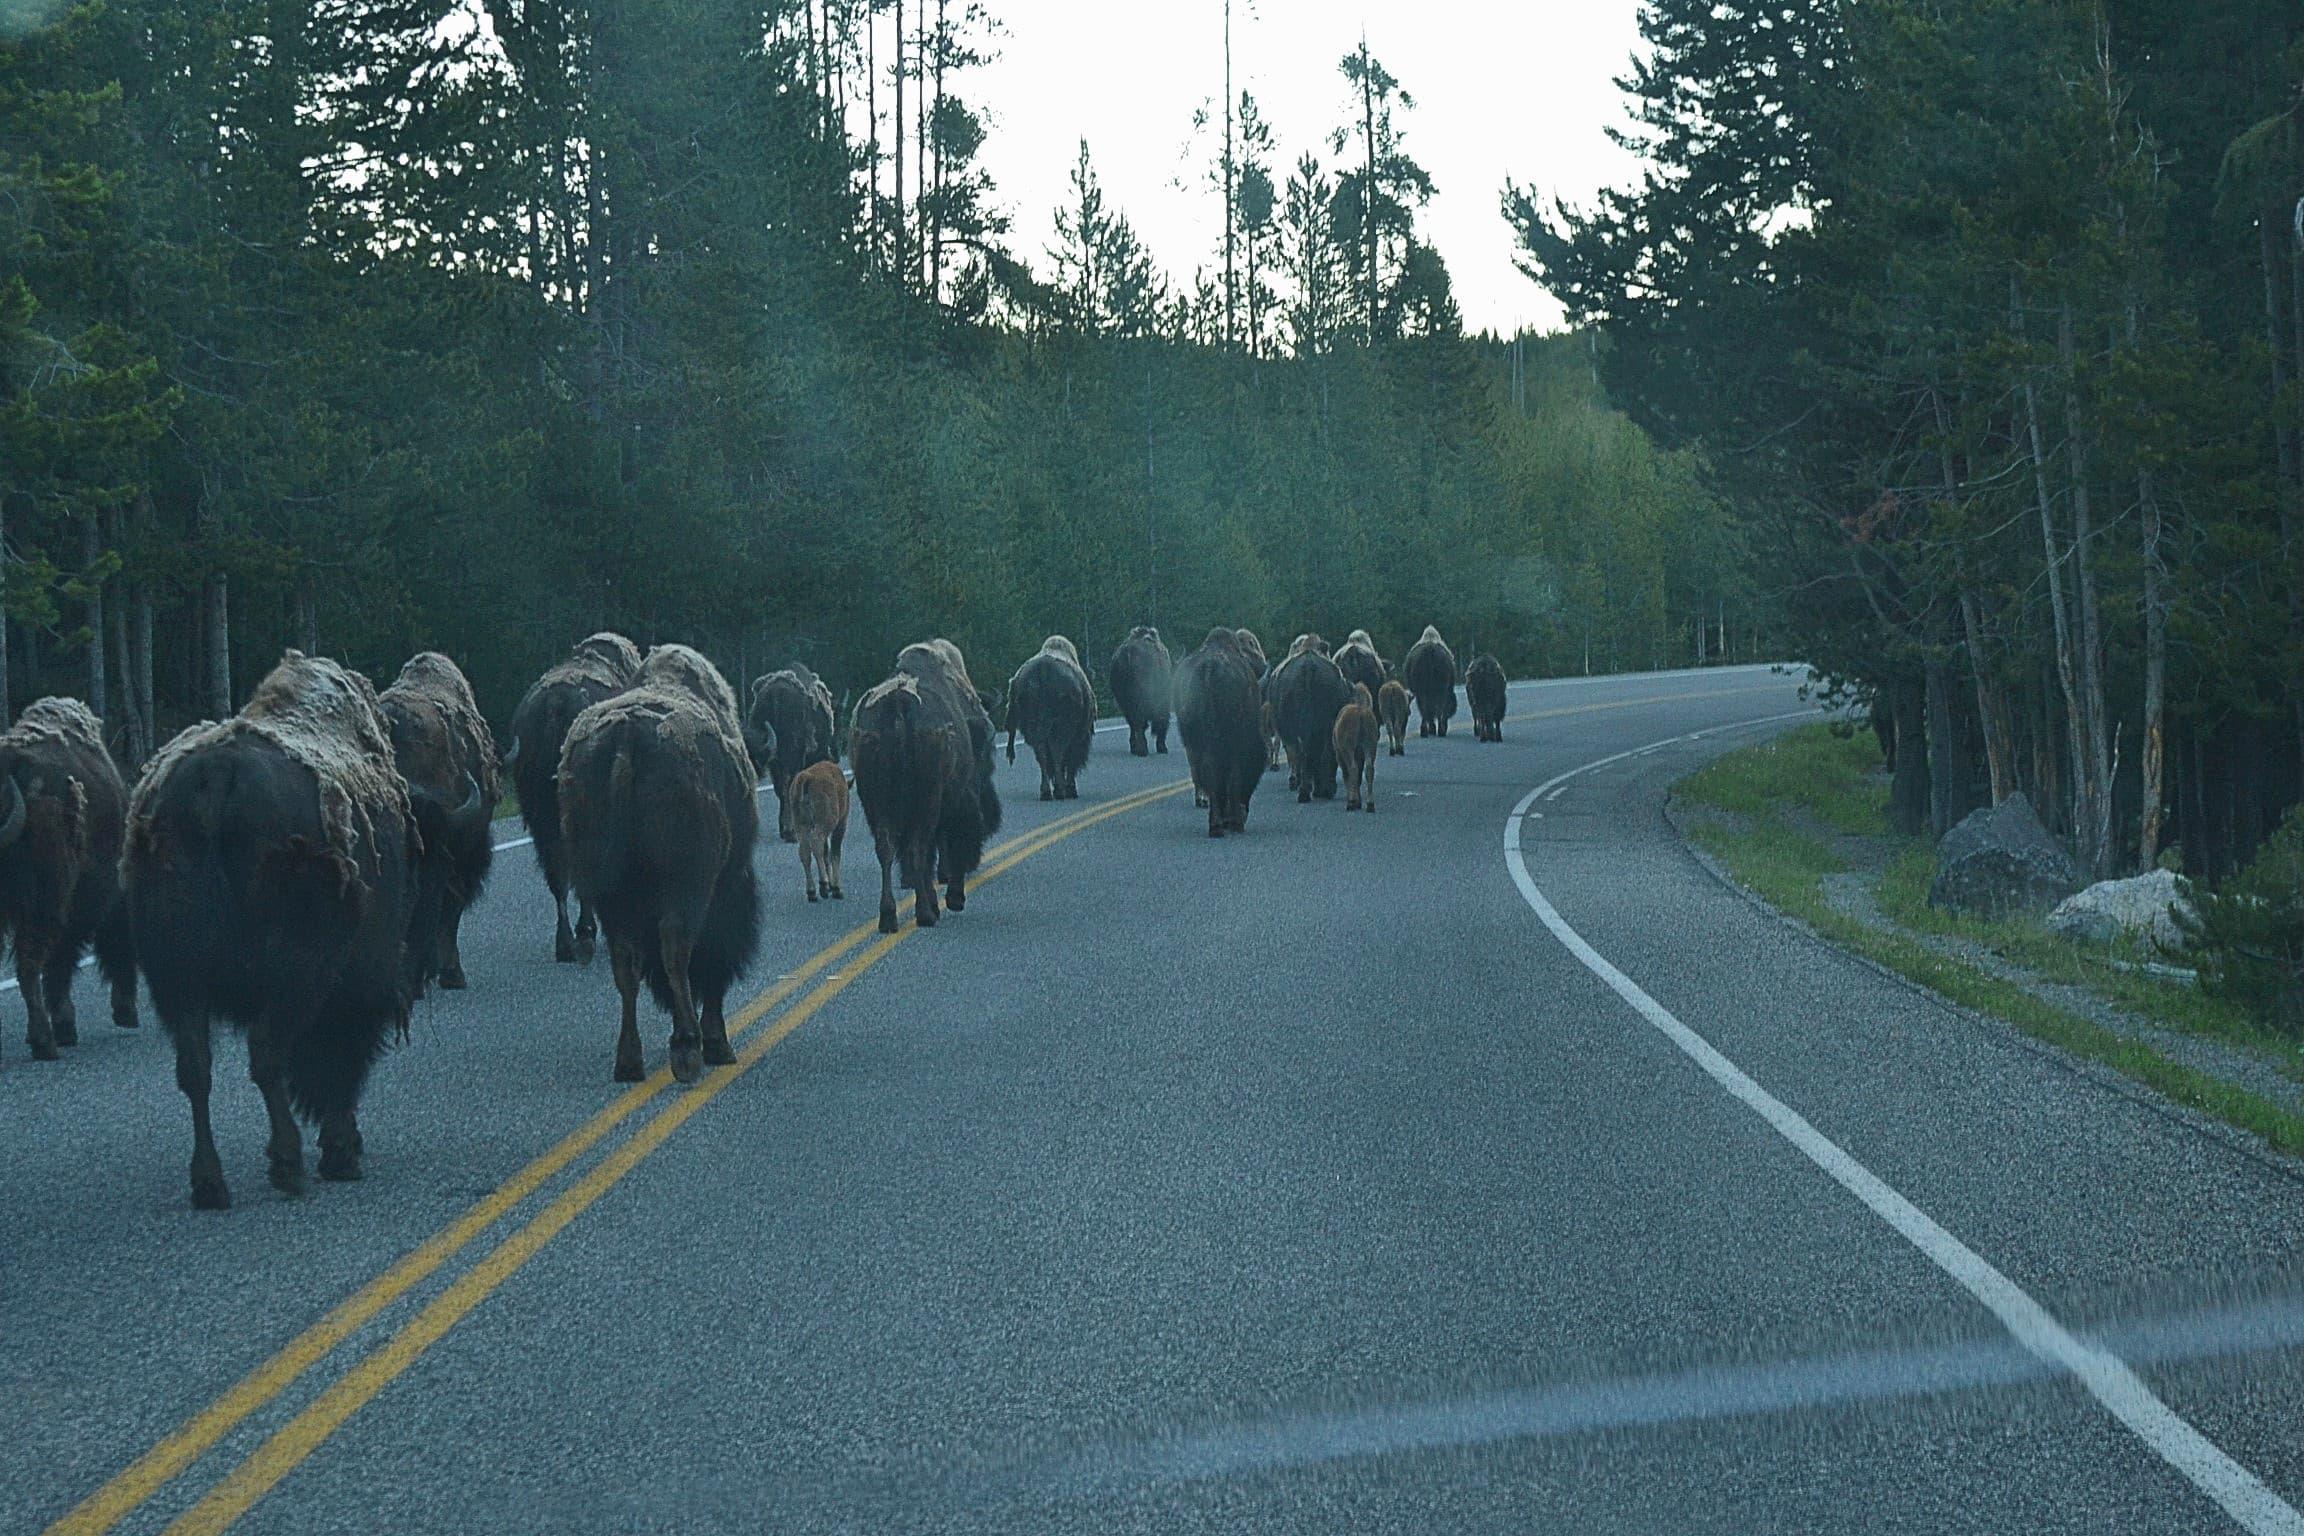 Herd of buffalo walking the road in Yellowstone park.